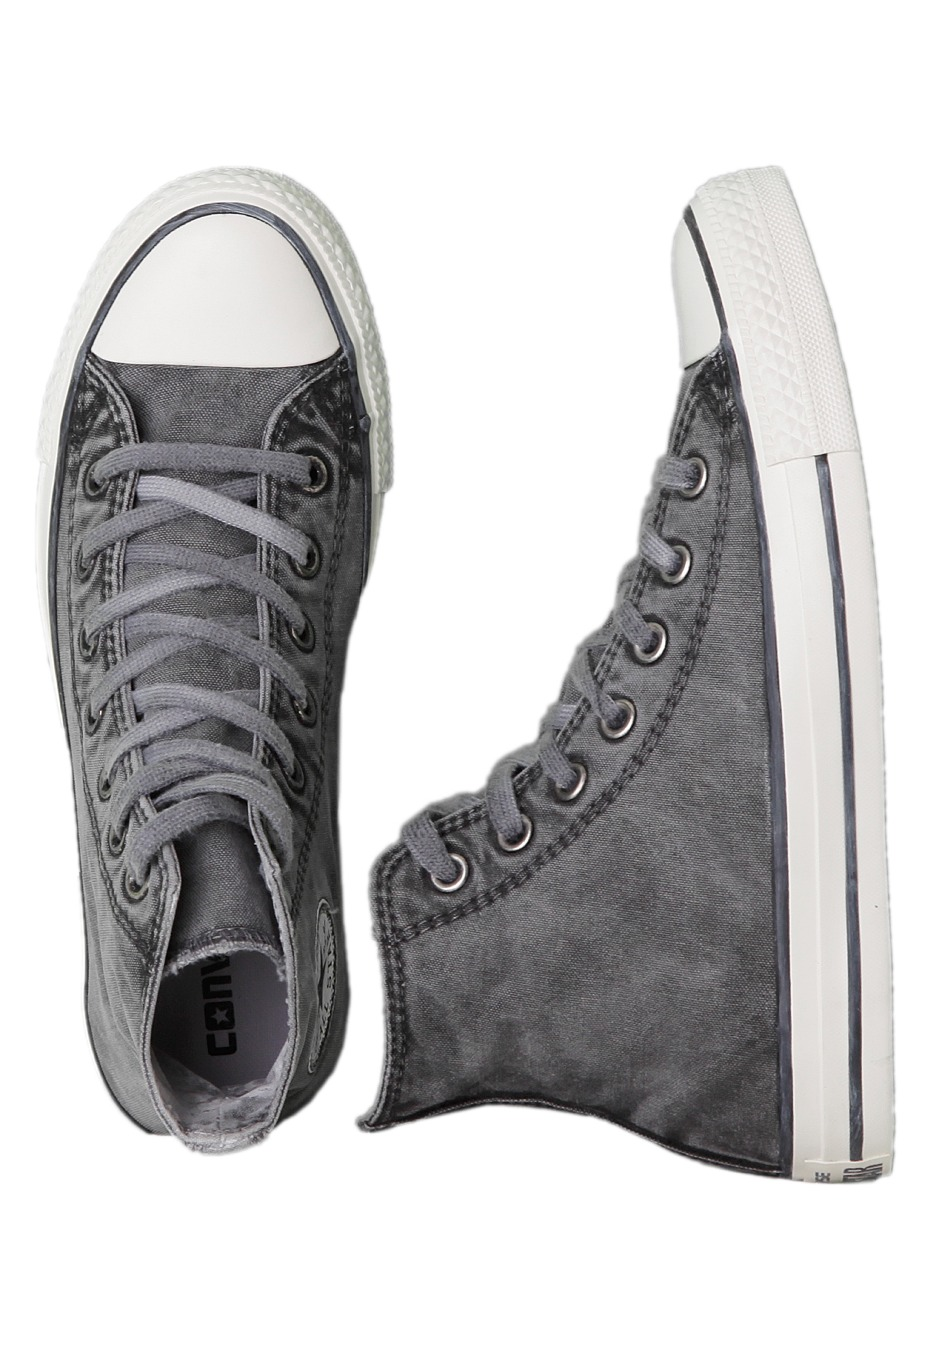 03e711944974 Converse - Chuck Taylor All Star Hi Converse Black - Girl Shoes ...